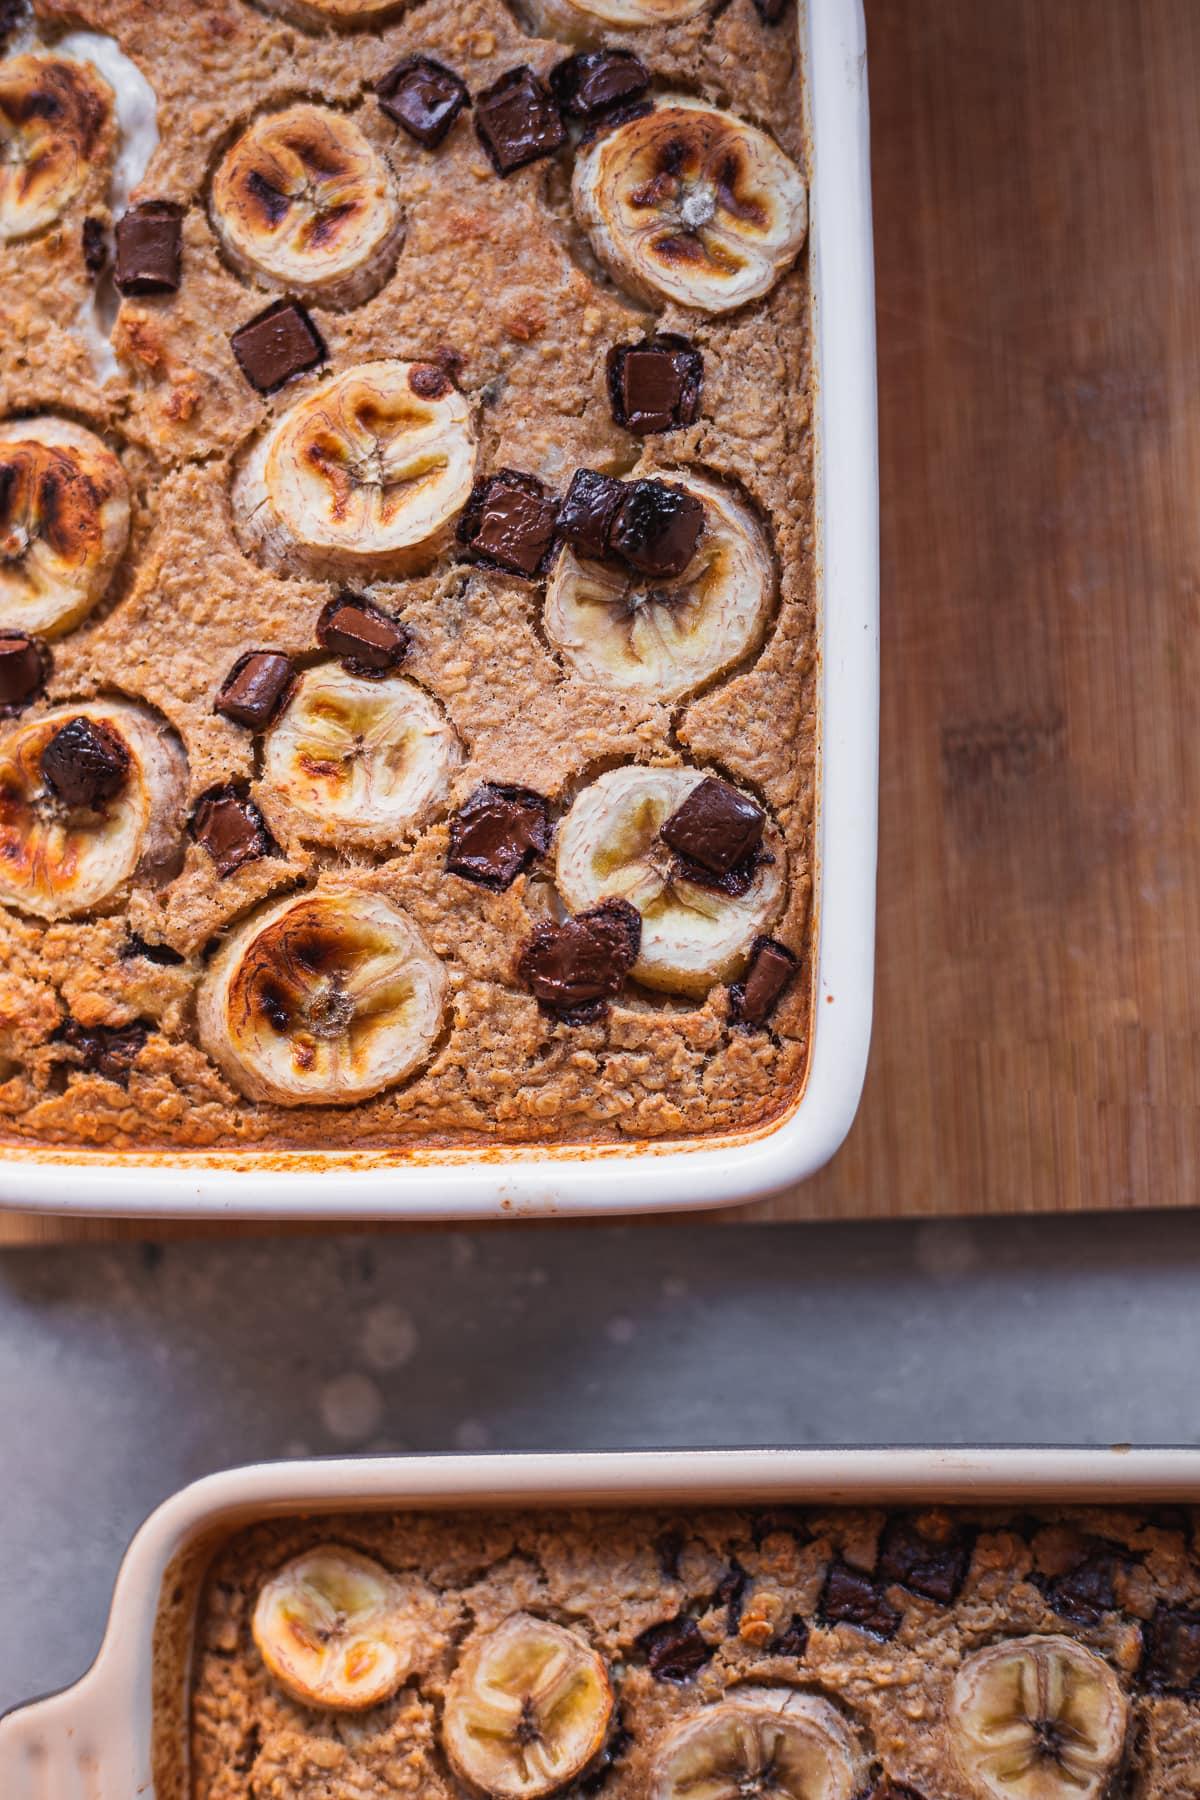 Two trays of banana bread baked oats